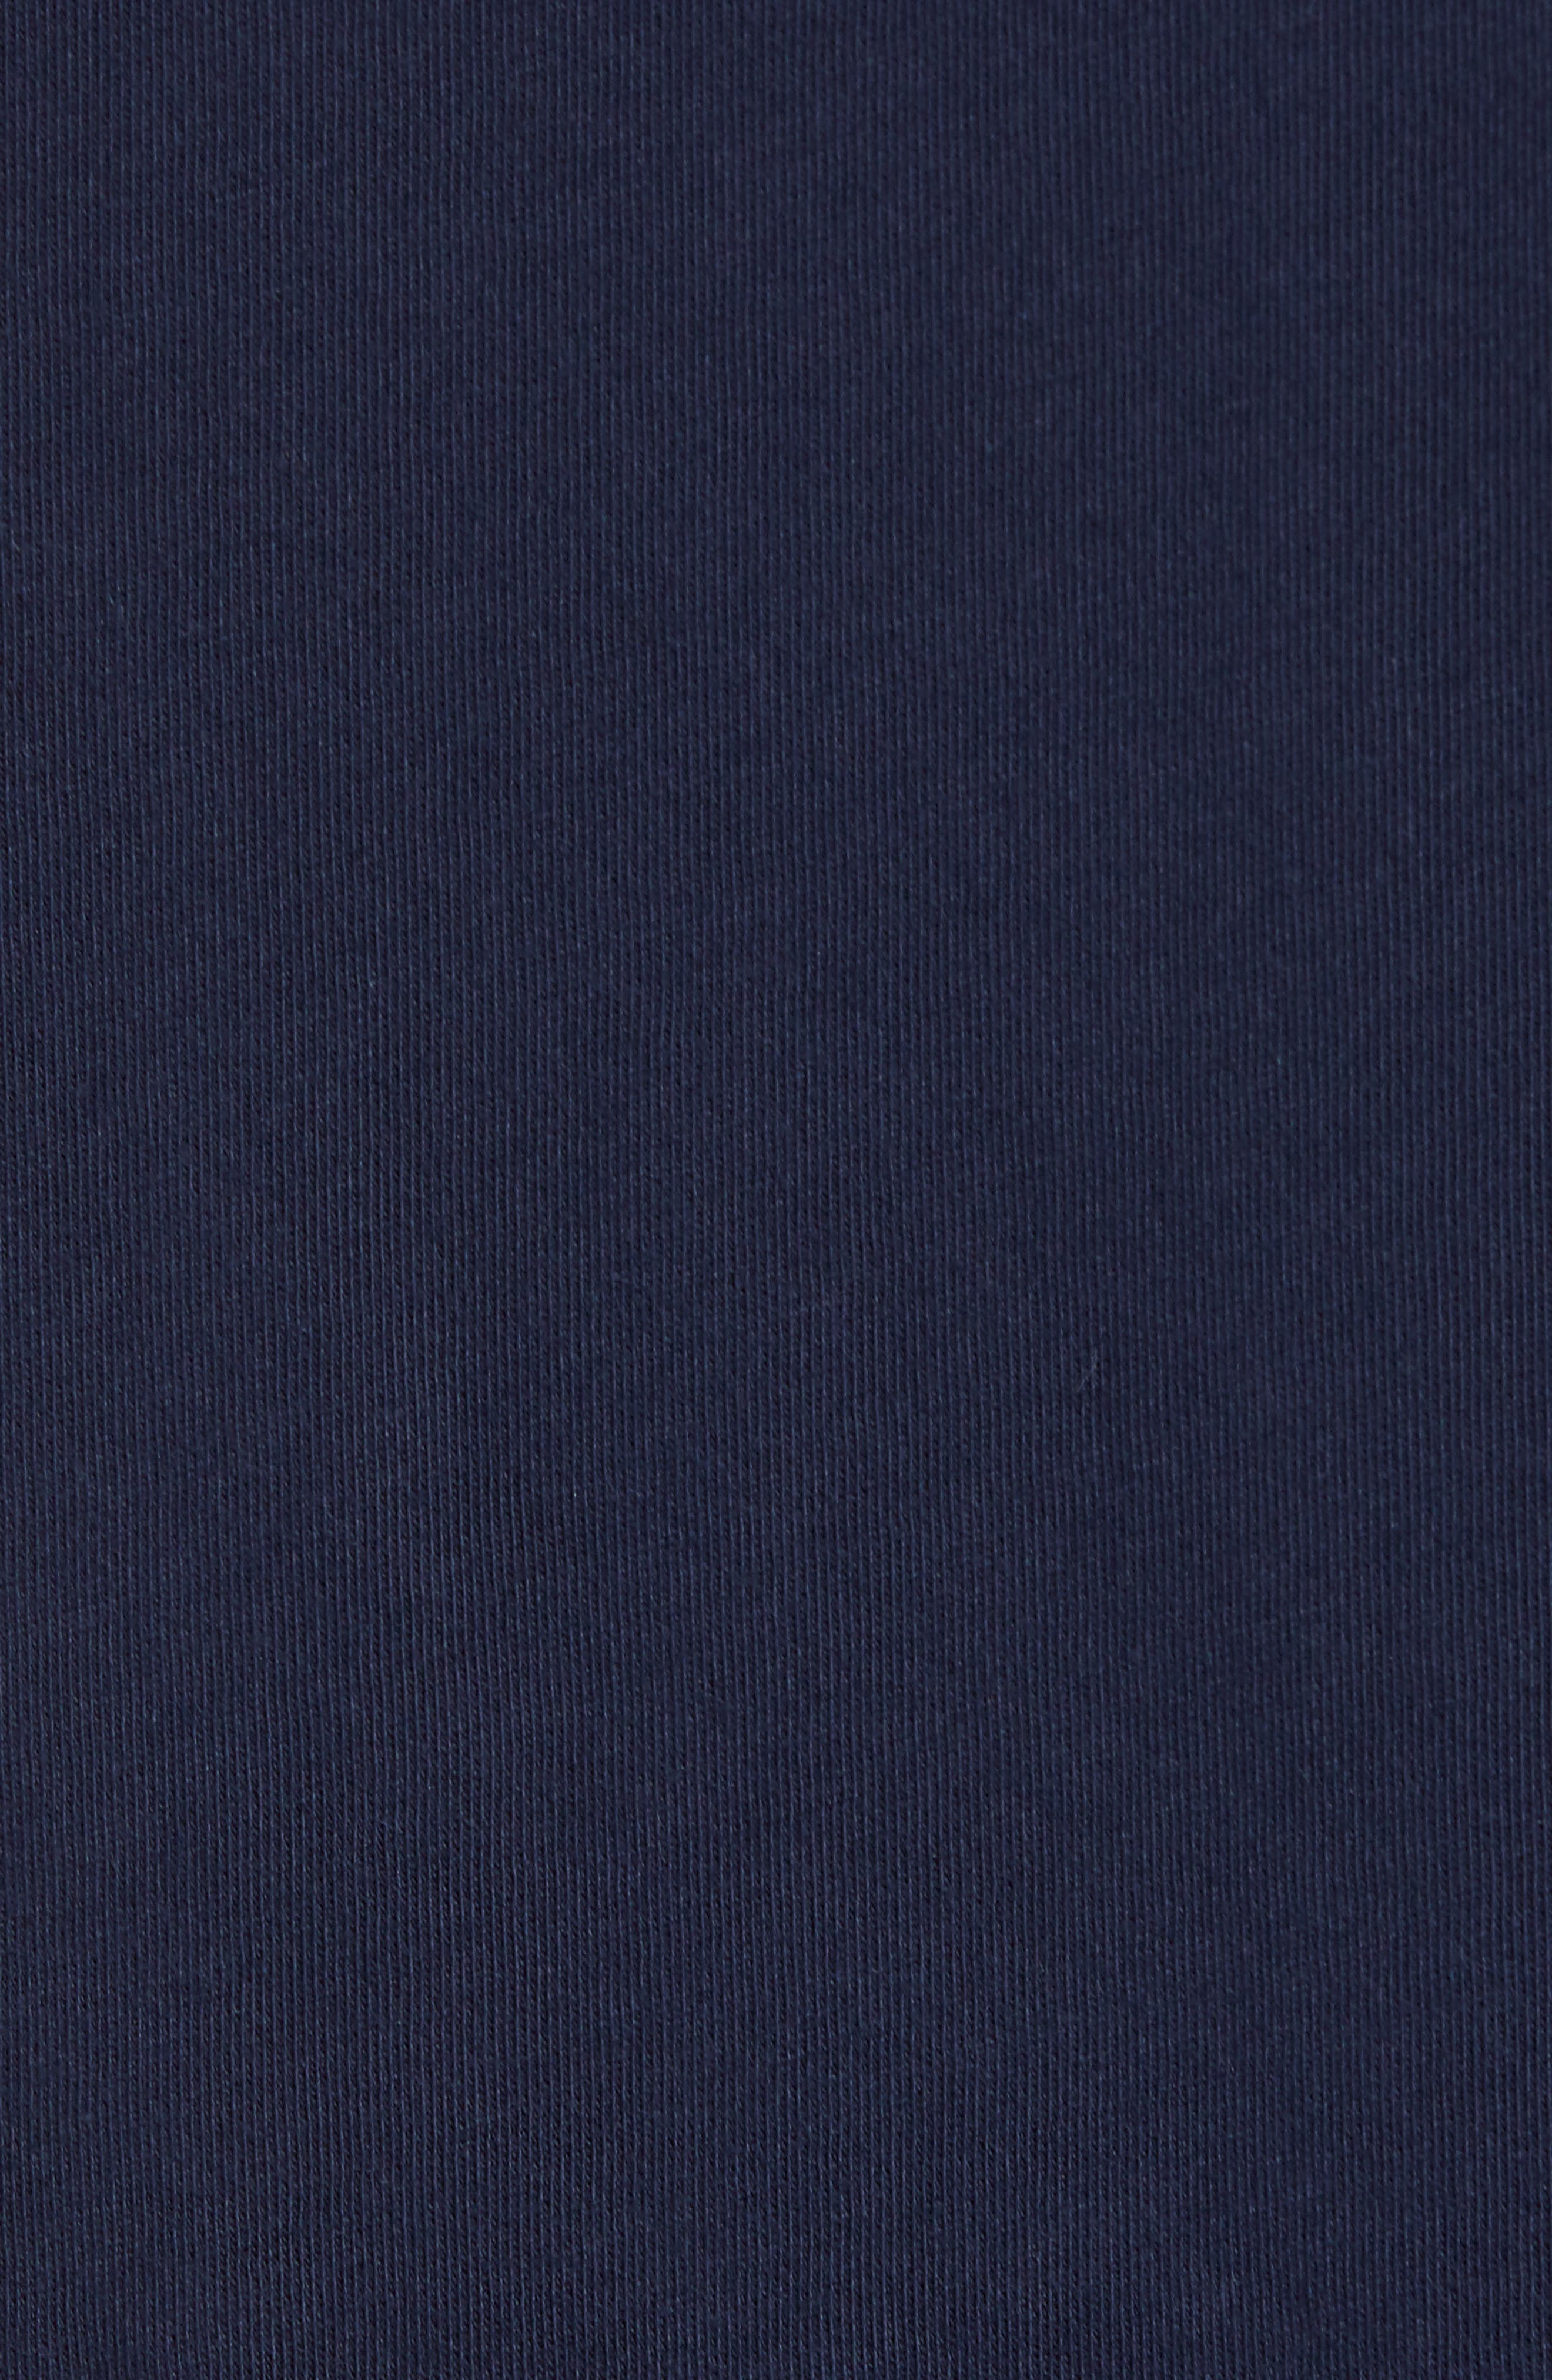 Graphic T-Shirt,                             Alternate thumbnail 5, color,                             Navy Blue